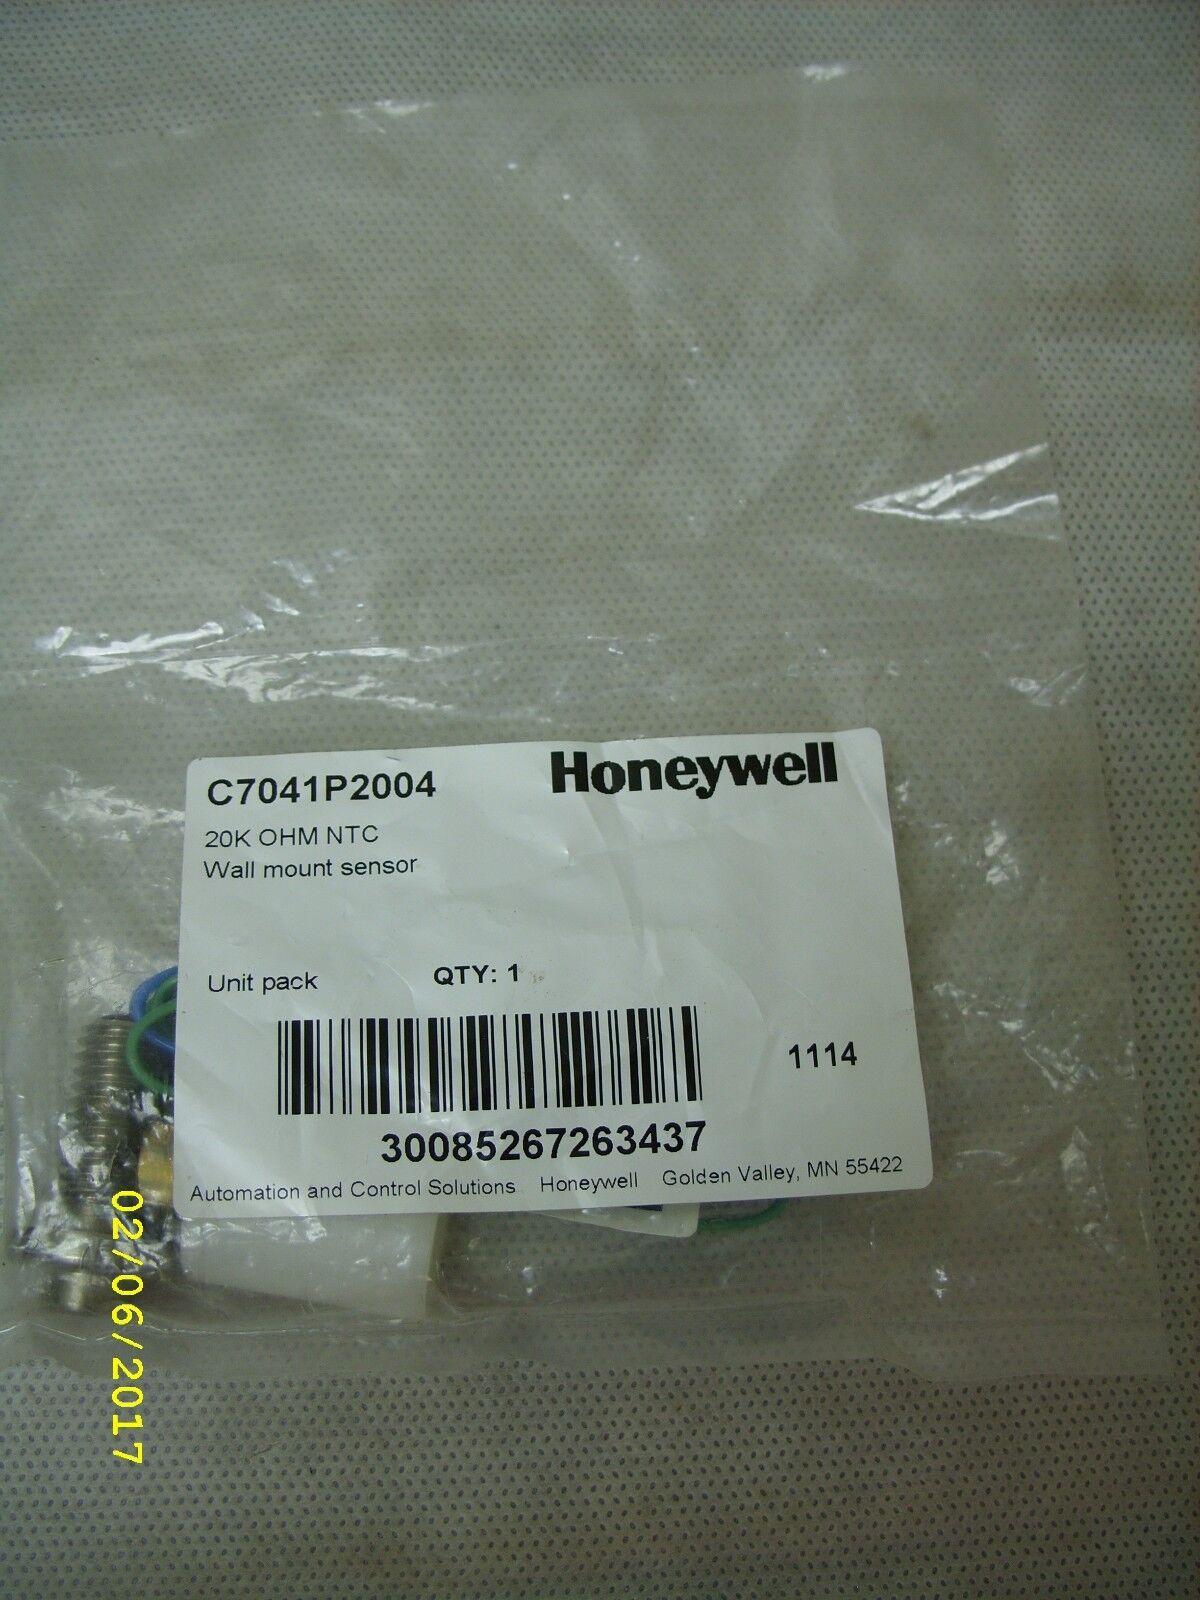 Honeywell 27.9 40.6cm Edelstahl Knopf Sensor - 20k Ohm Ntc Ntc Ntc - C7041p2004 Neu 5037b9